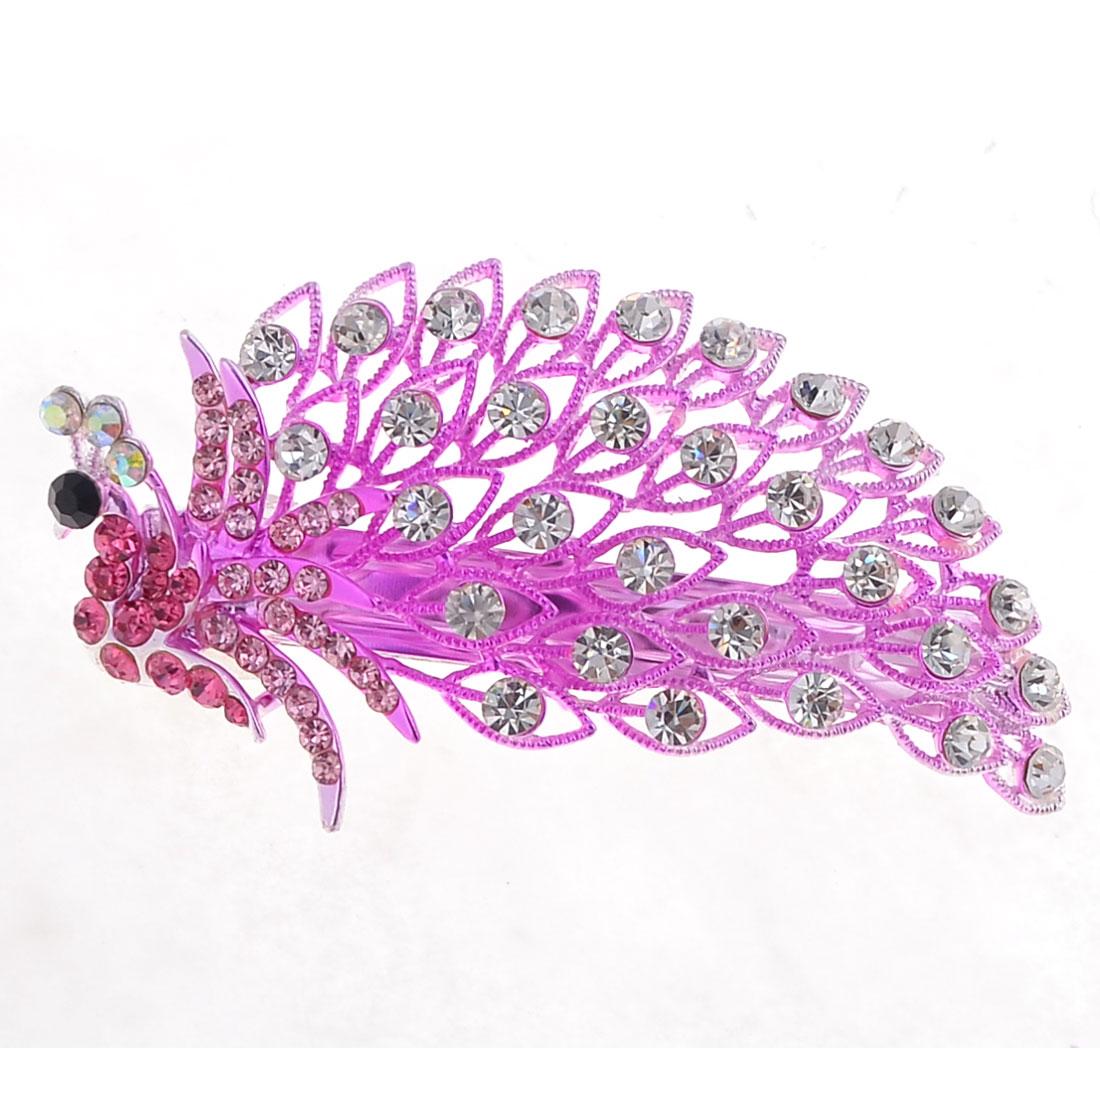 Girl Metal Peacock Style Banquet Glittery Rhinestone Barrette Hair Clip Fushcia